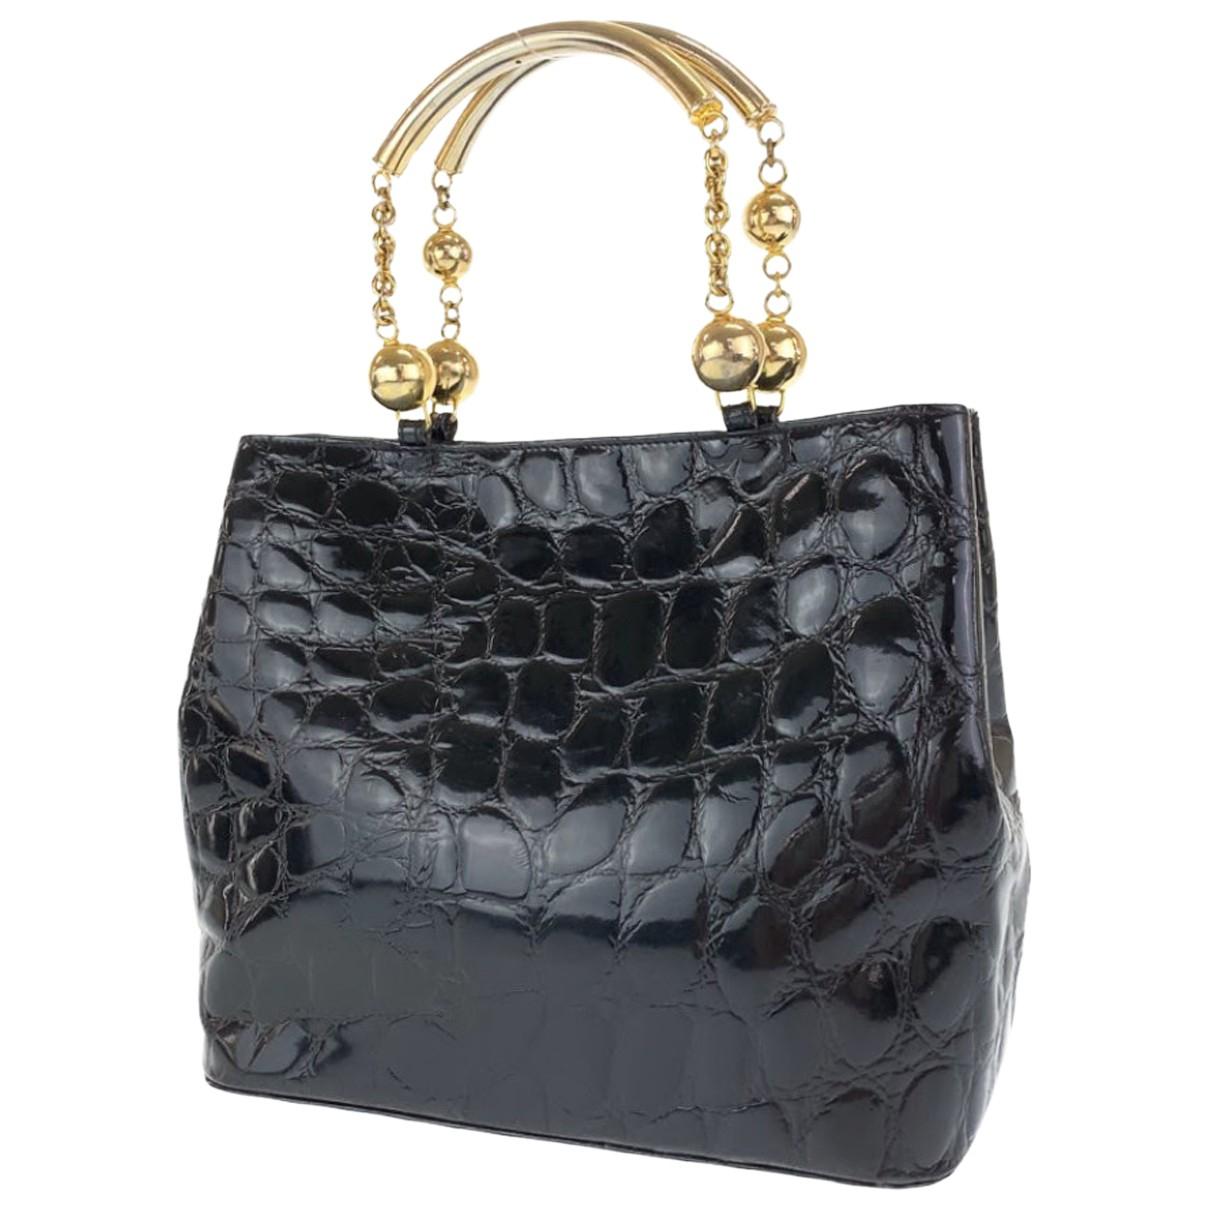 Gianni Versace N Leather handbag for Women N